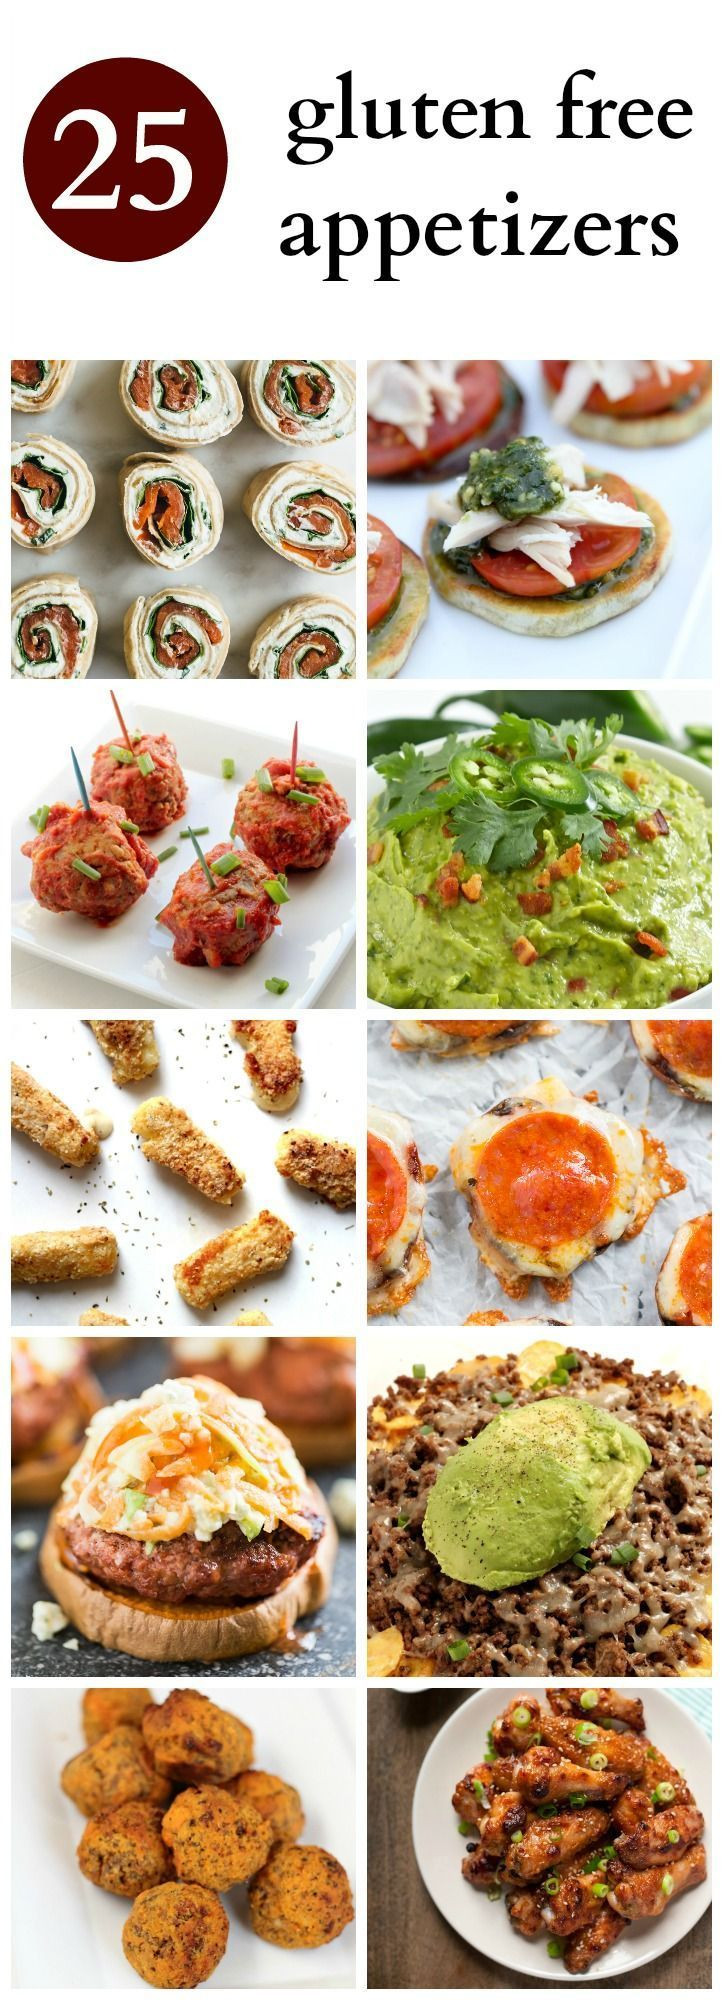 Gluten Free Dairy Free Appetizers  158 best Gluten Free Appetizers images on Pinterest